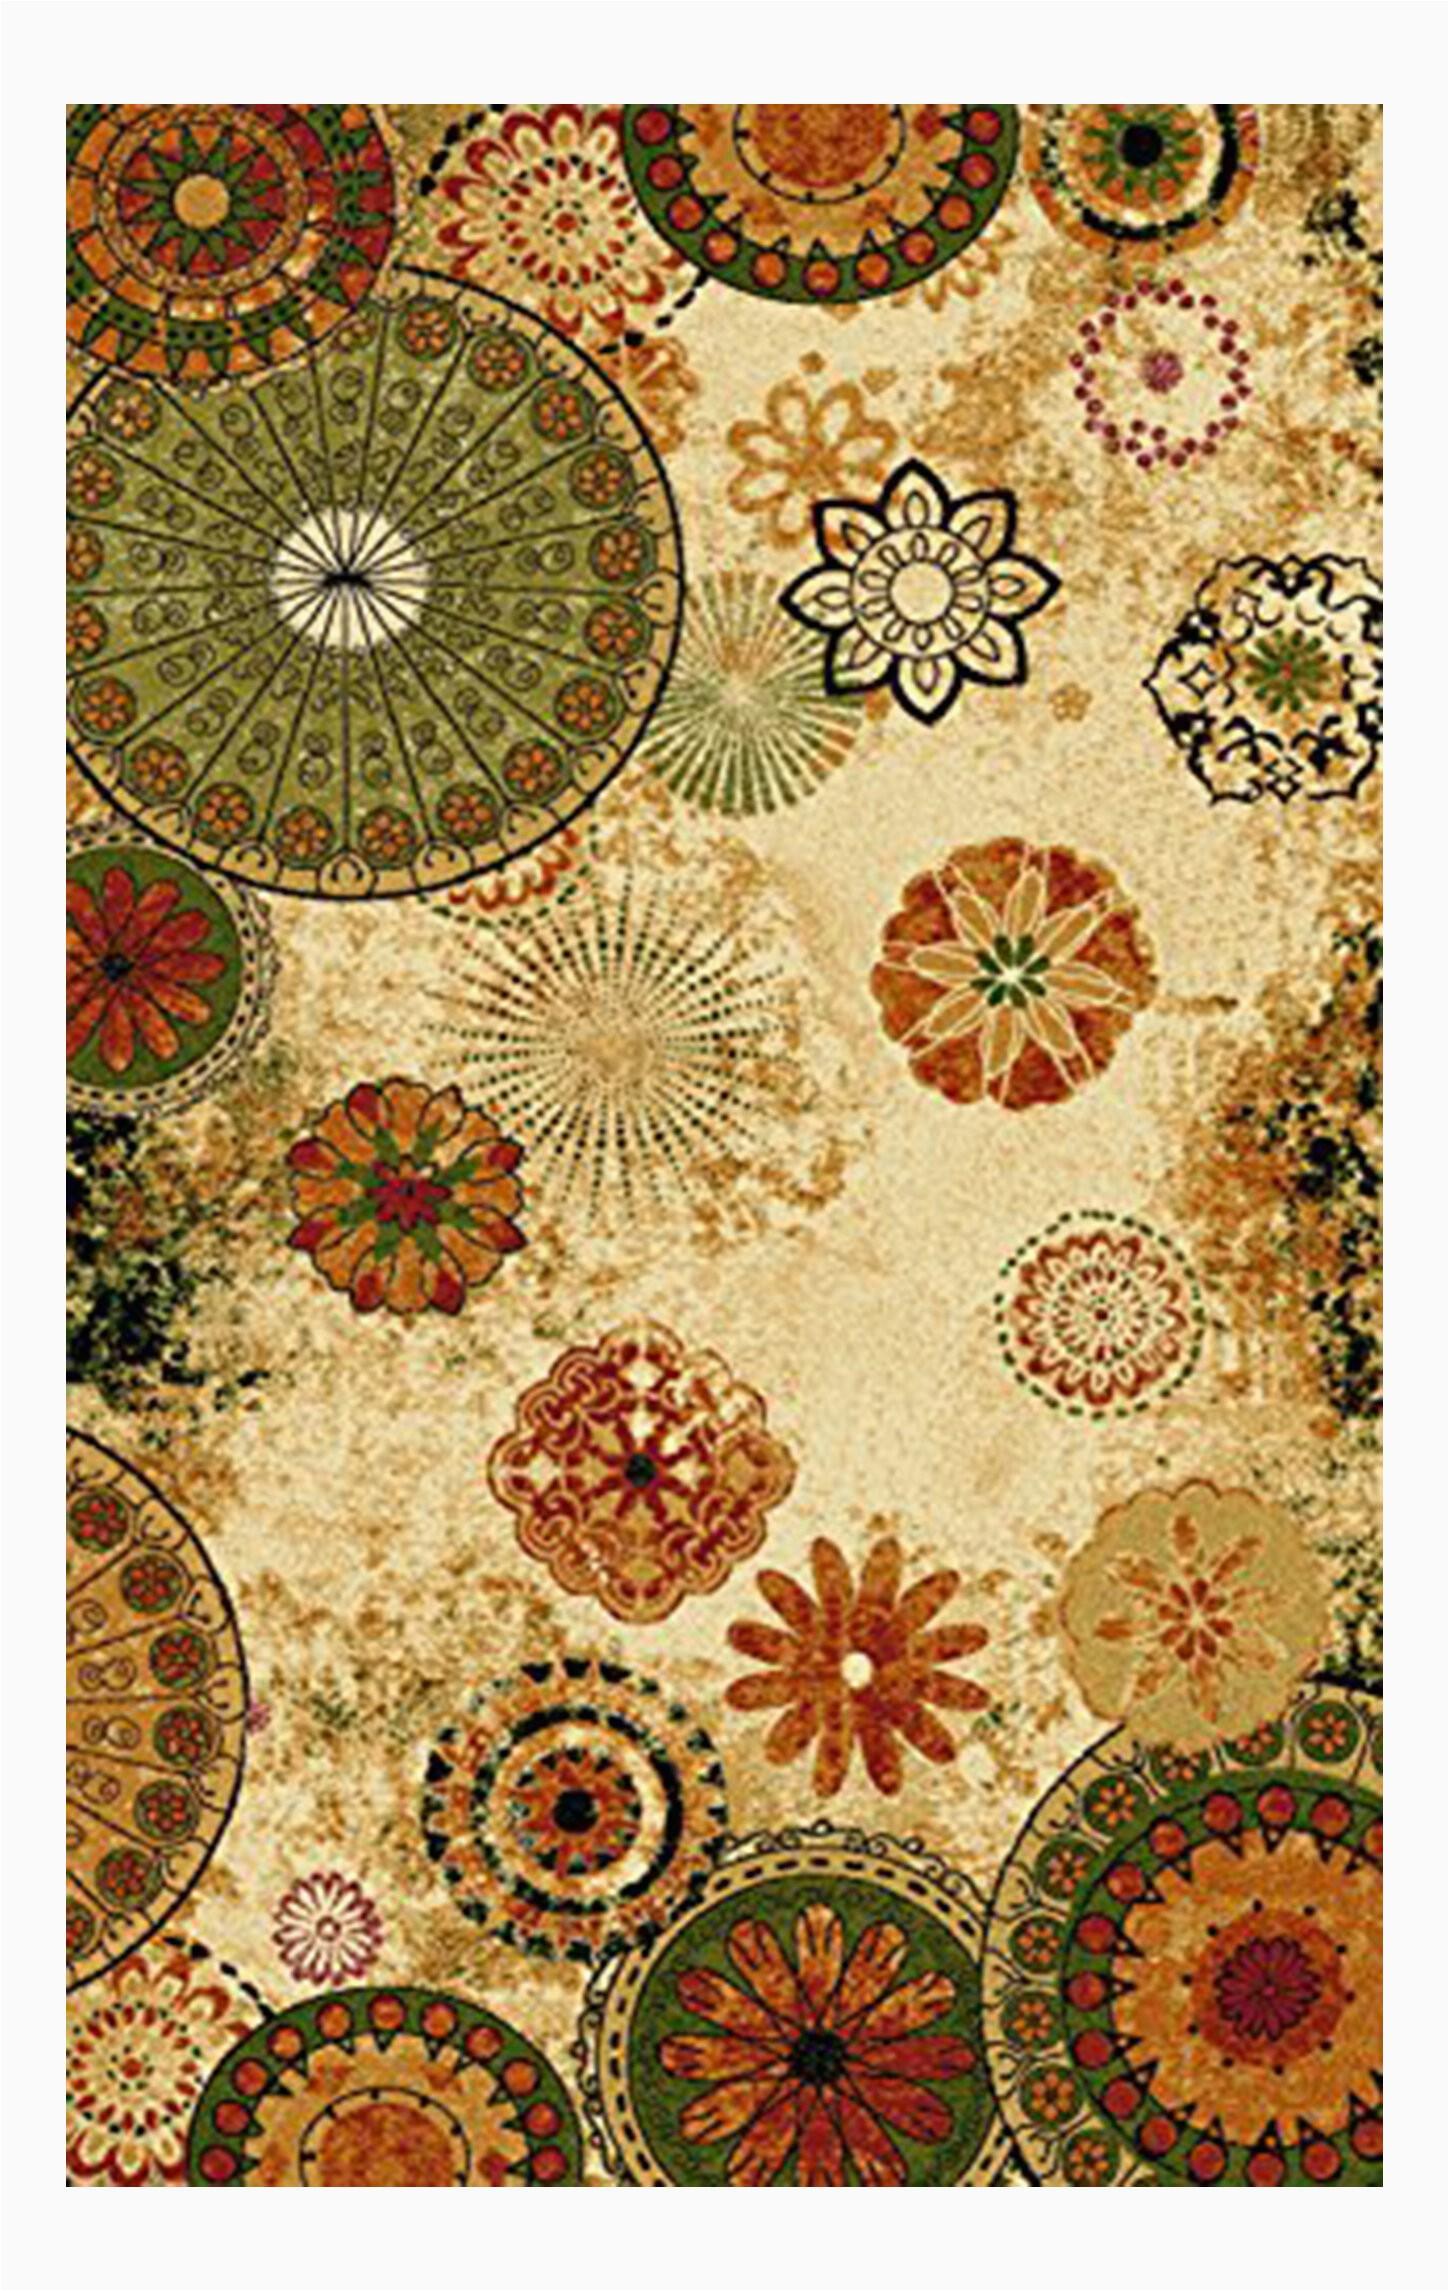 derlyum anti bacterial floral tufted yelloworangegreen area rug